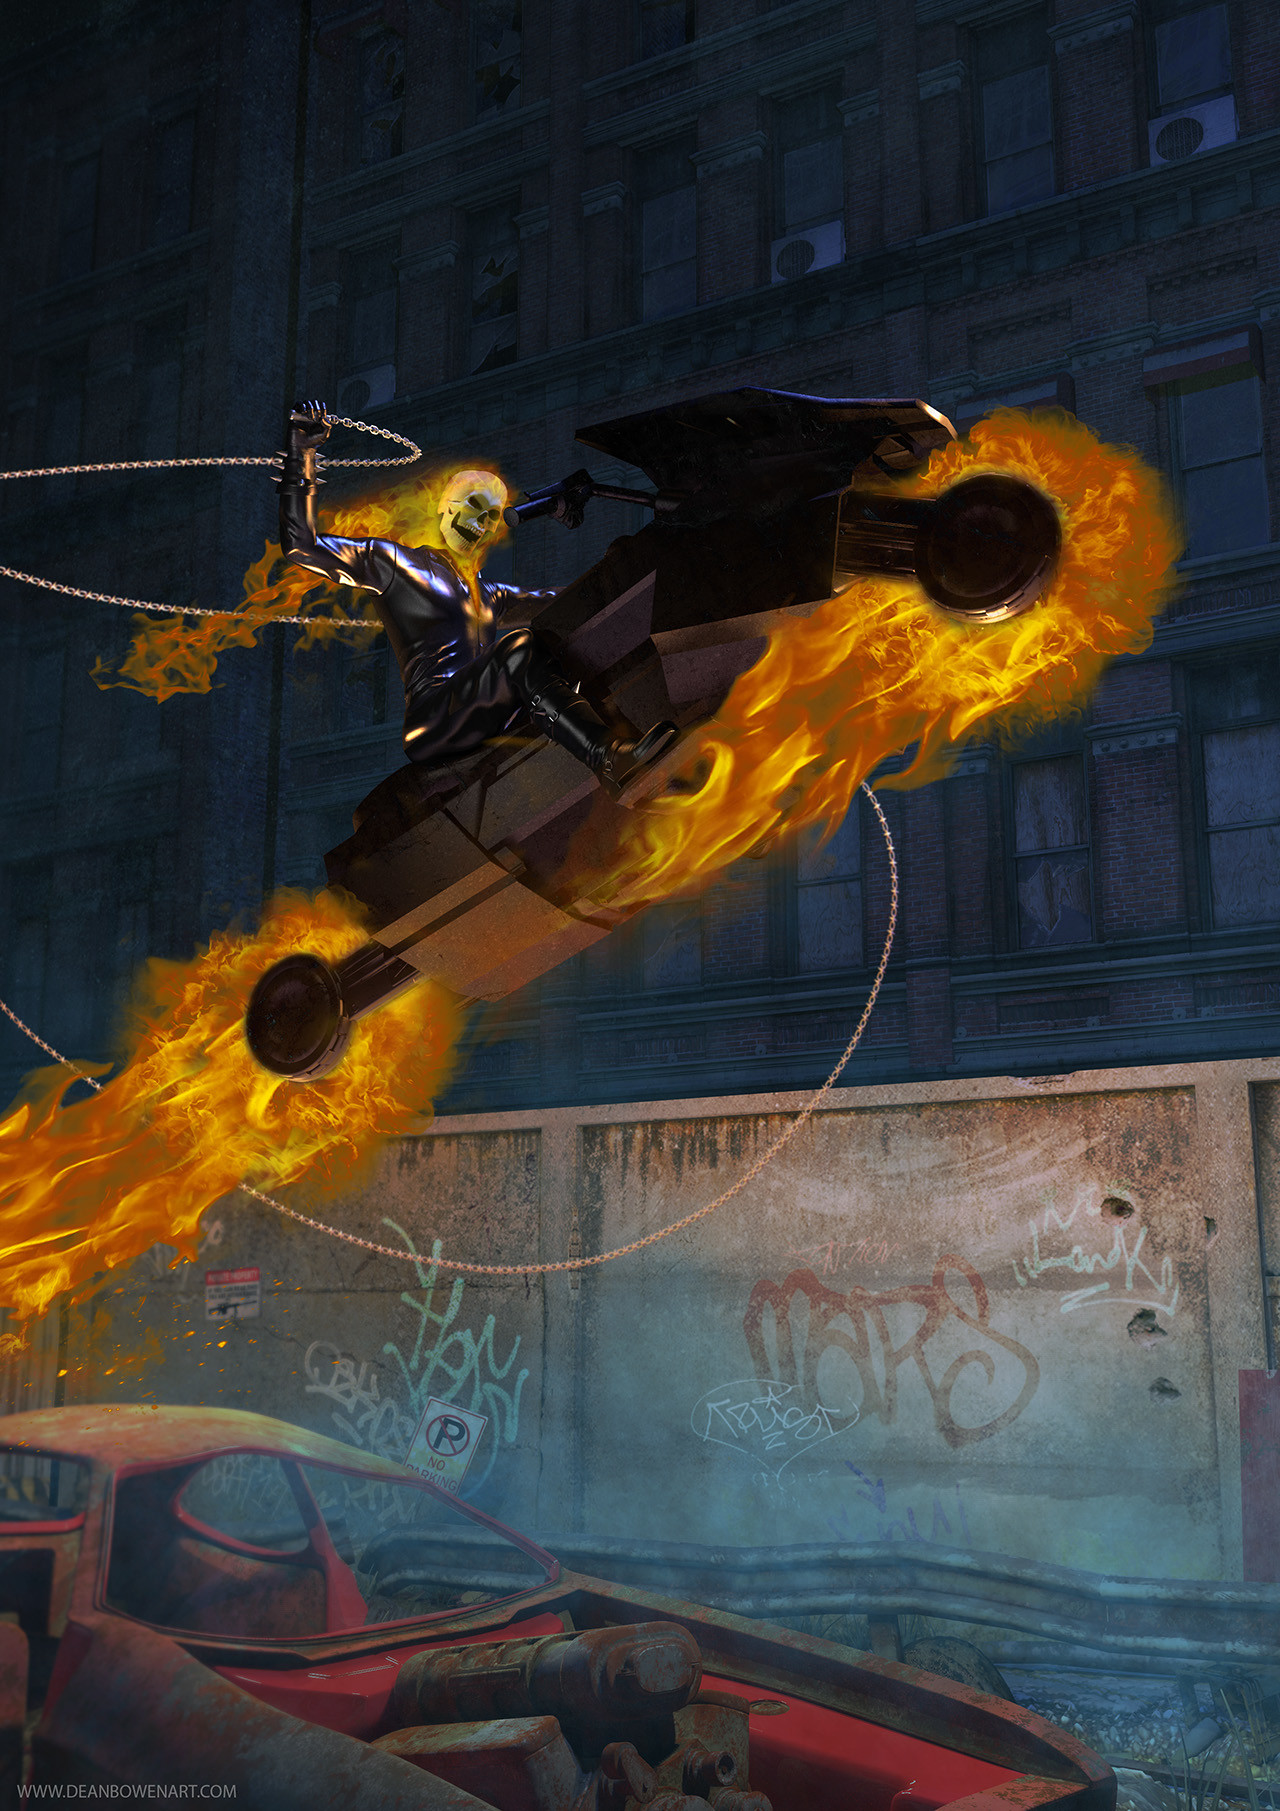 Dean bowen ghost rider resize